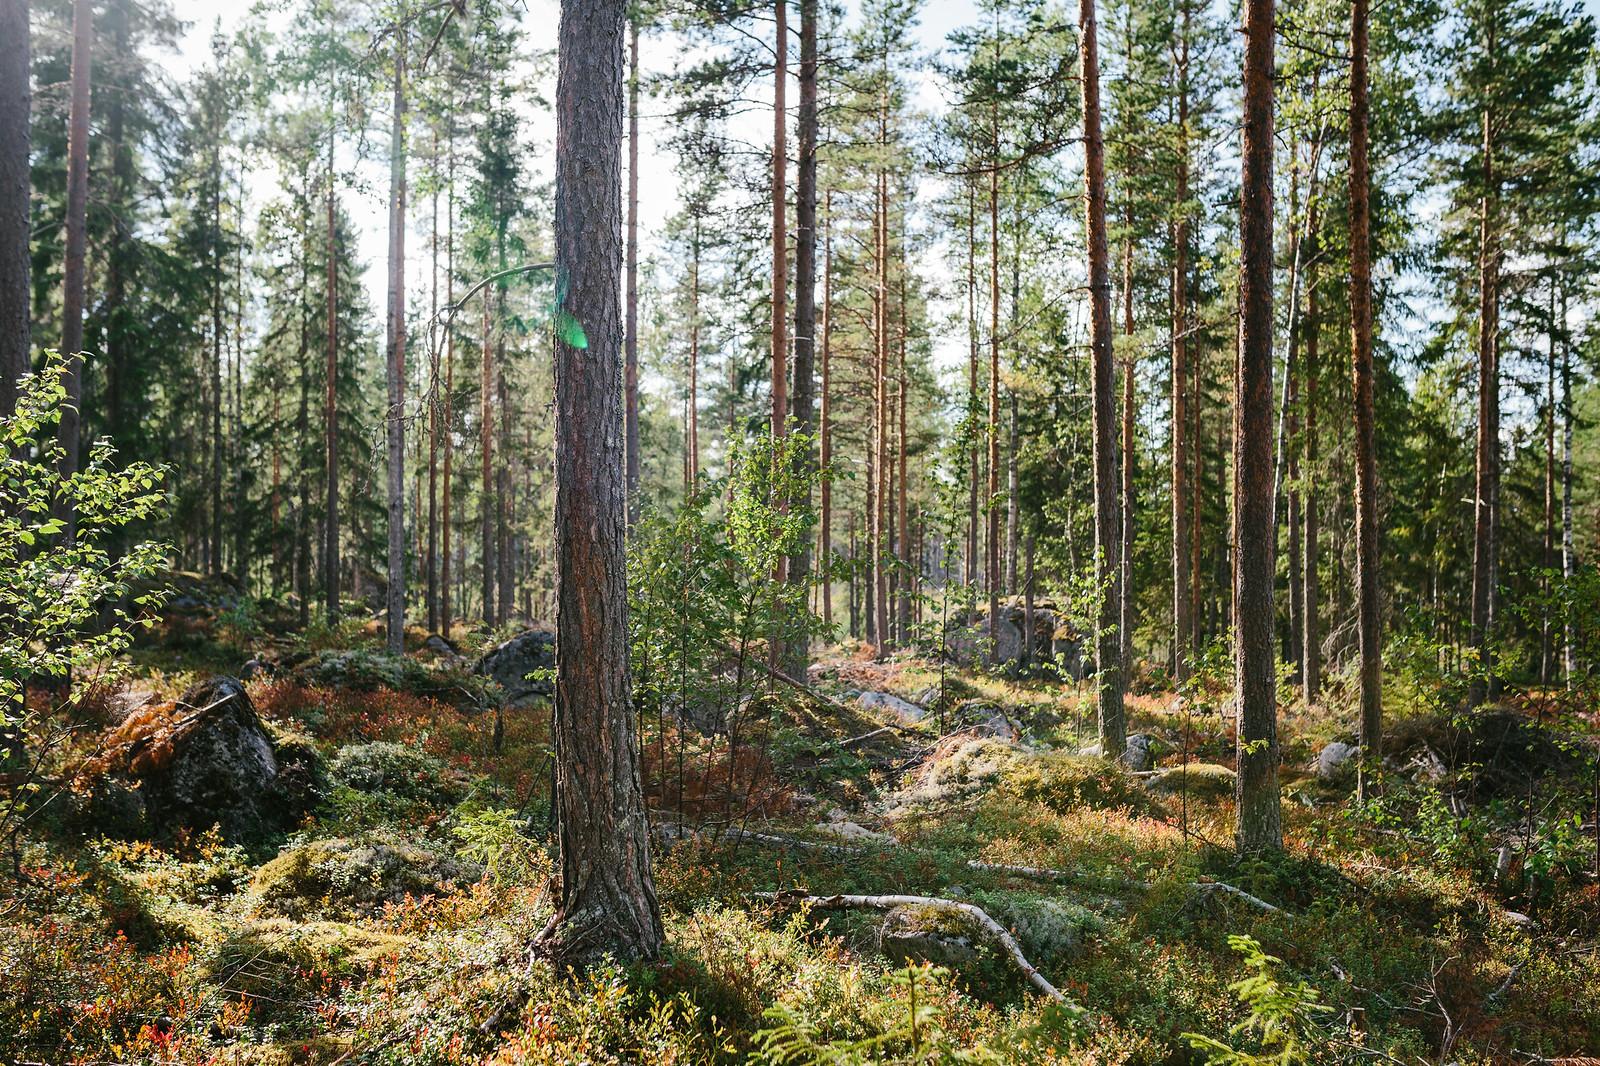 Skogen i eftermiddagssolen - Evelinas Ekologiska